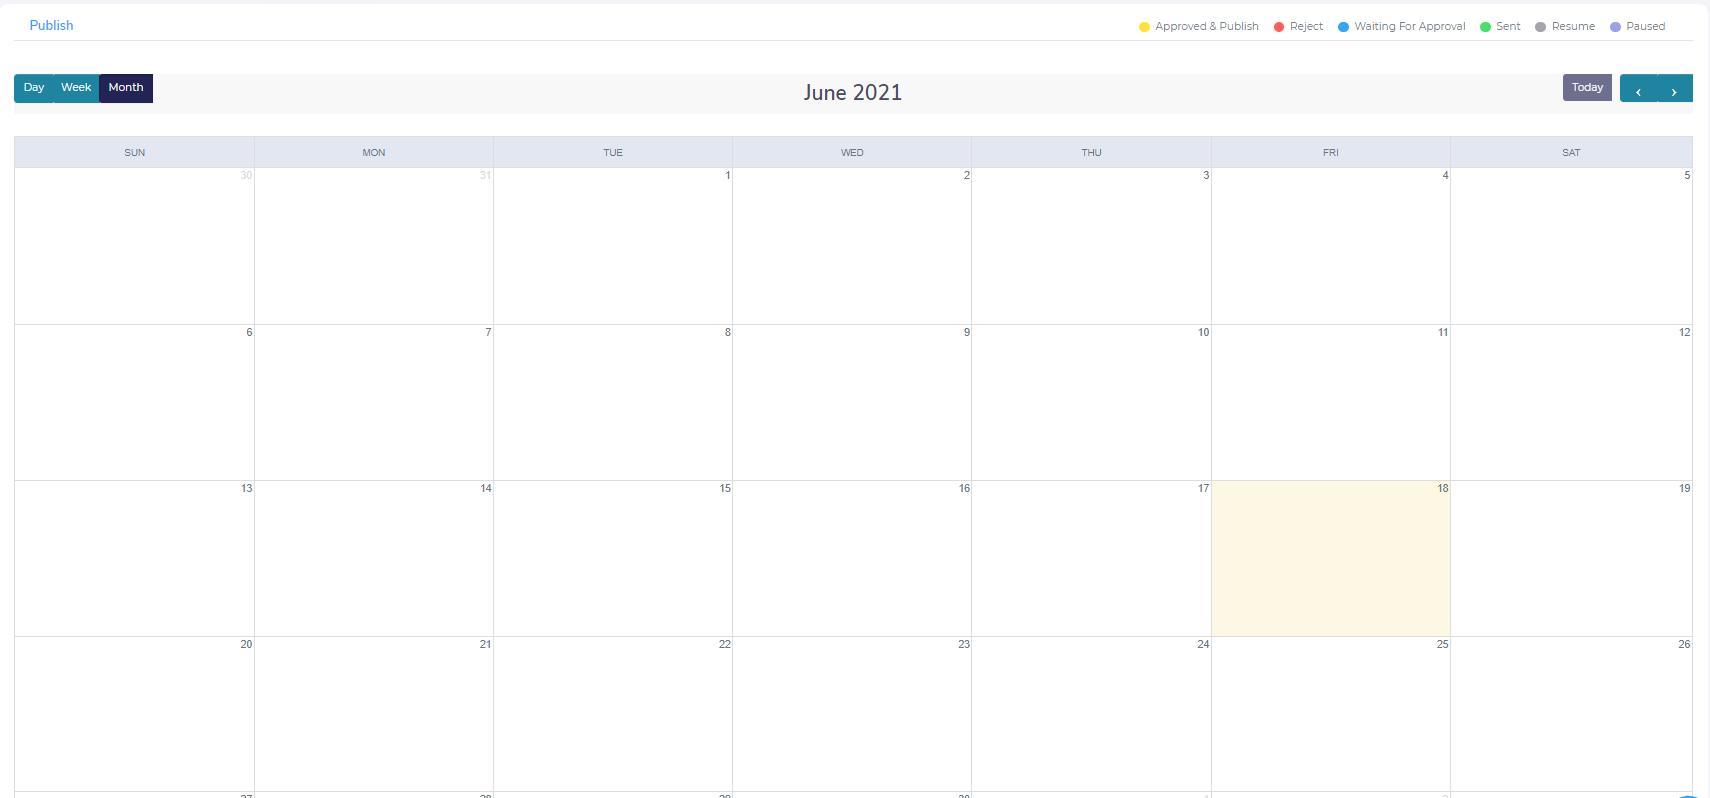 https://www.cloudsocial.io/wp-content/uploads/FAQ/Calendar.PNG